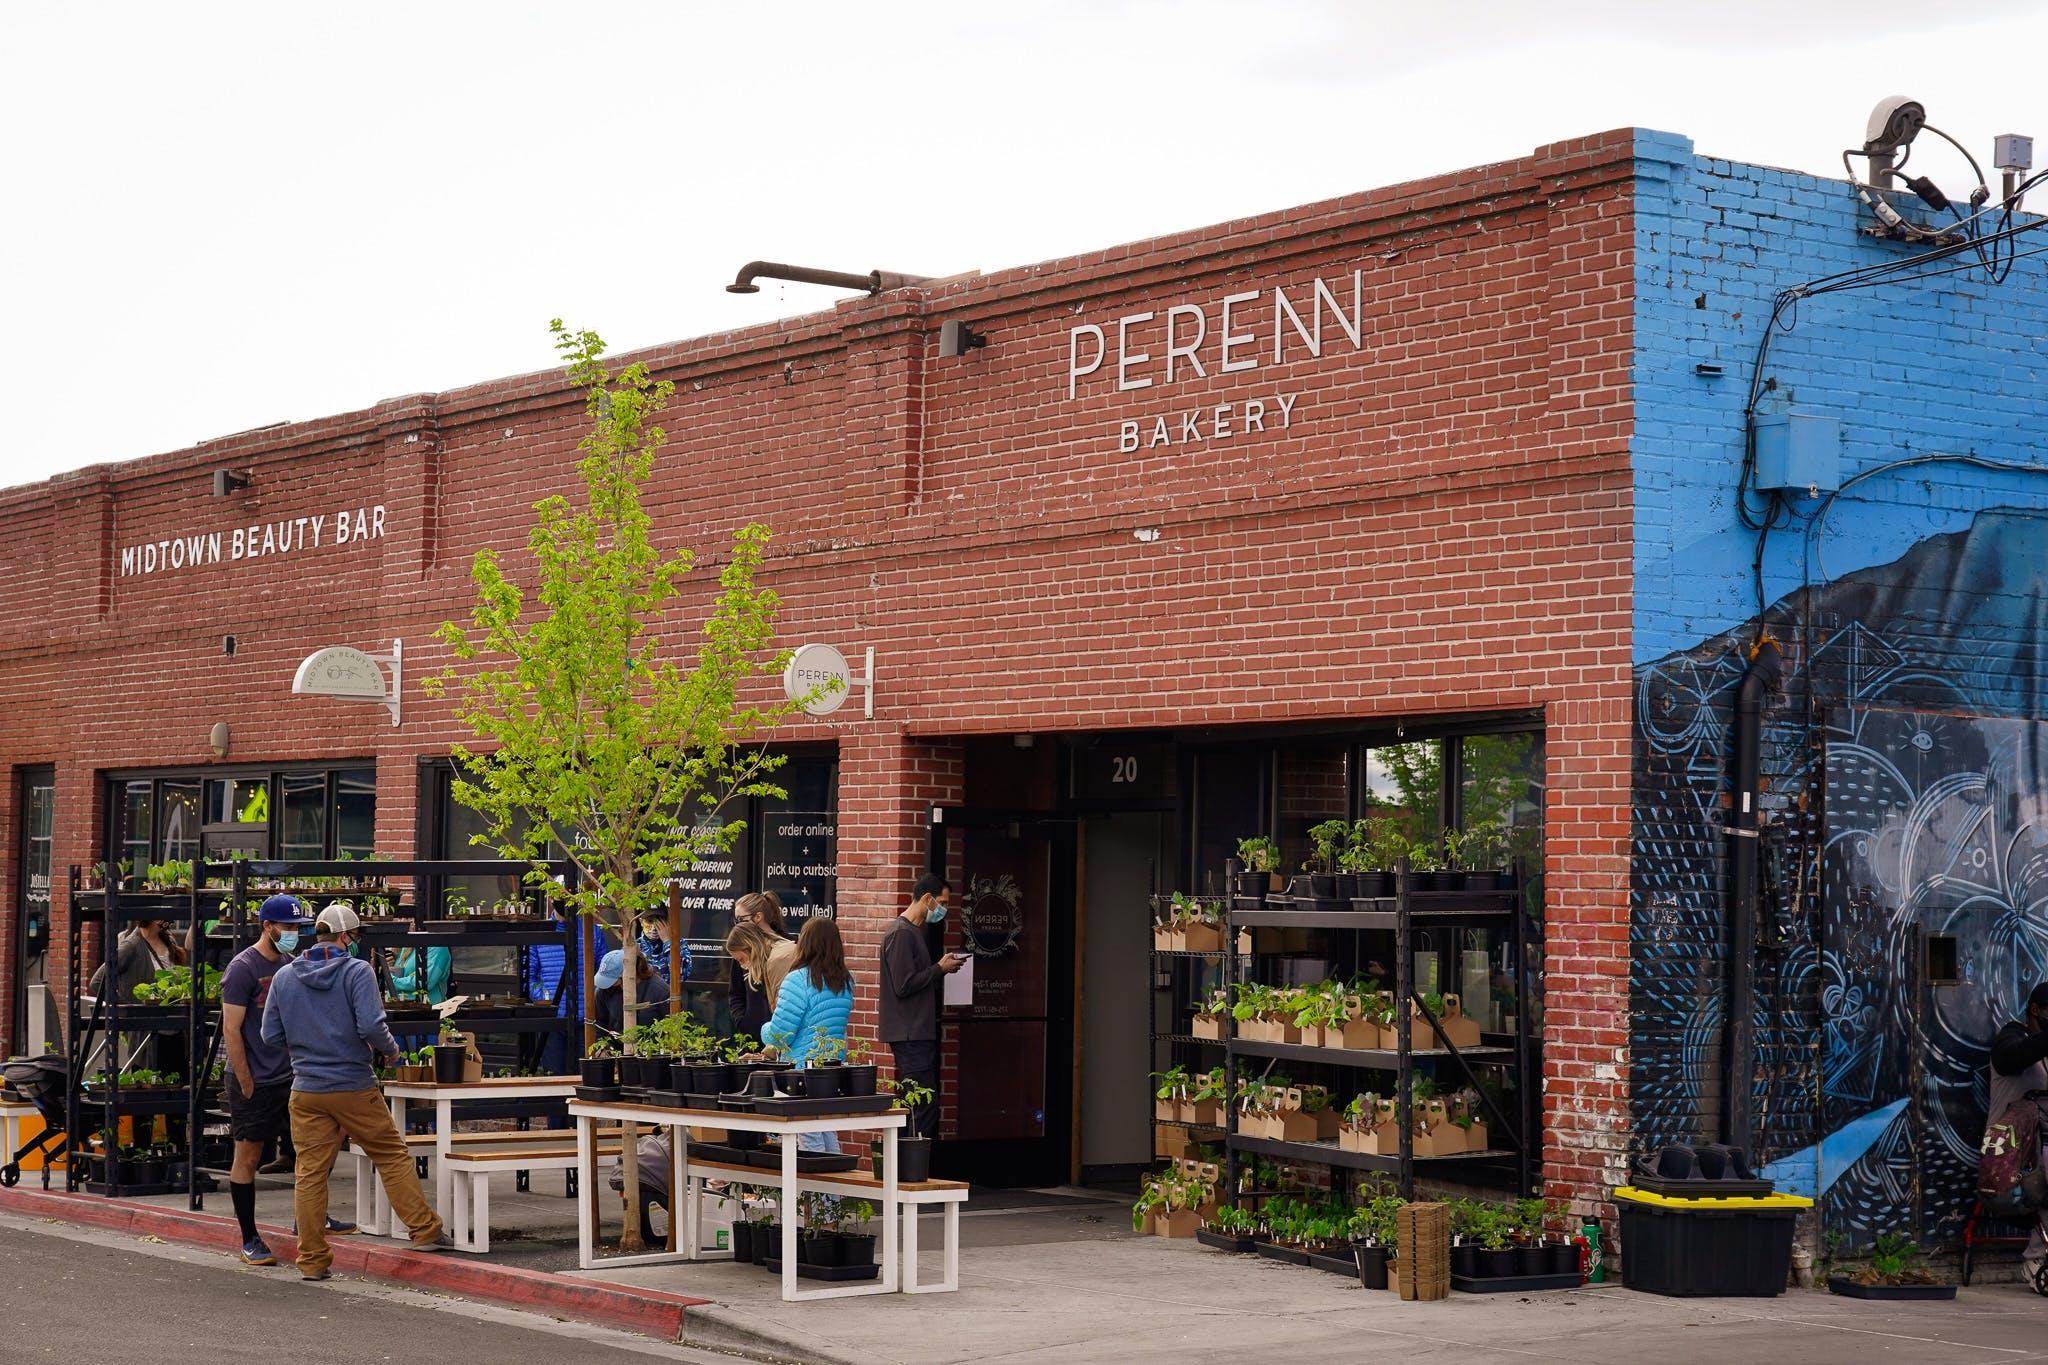 Perenn Bakery in Midtown Reno